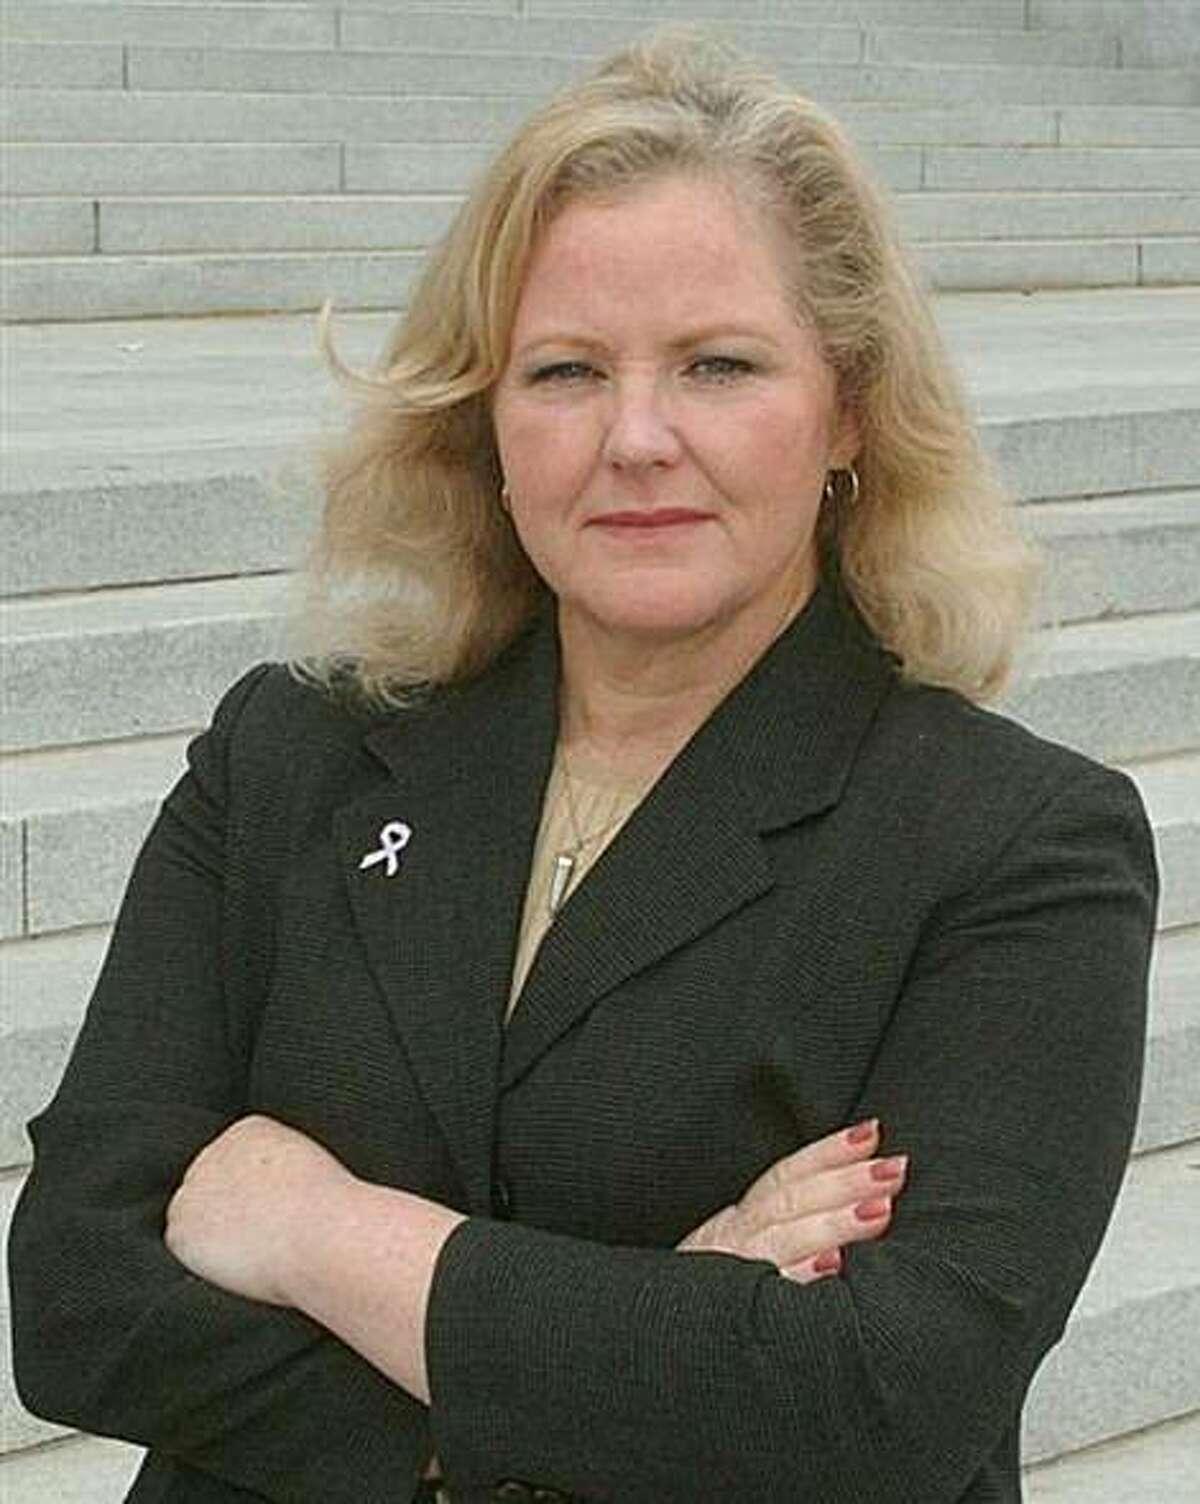 Alameda County District Attorney Nancy O'Malley